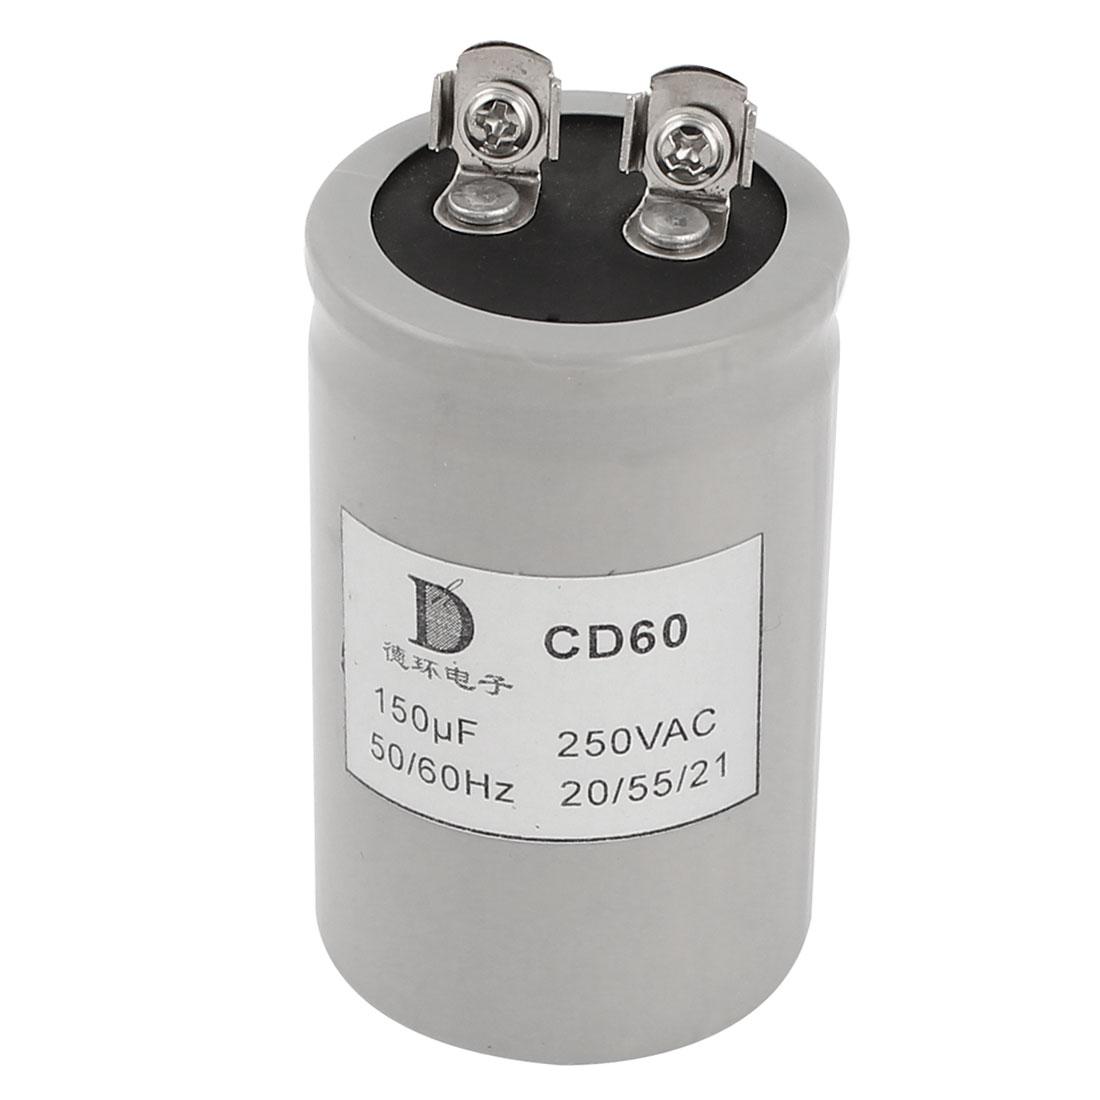 AC 250V 50/60Hz 150uF CD60 Type Motor Starting Capacitor